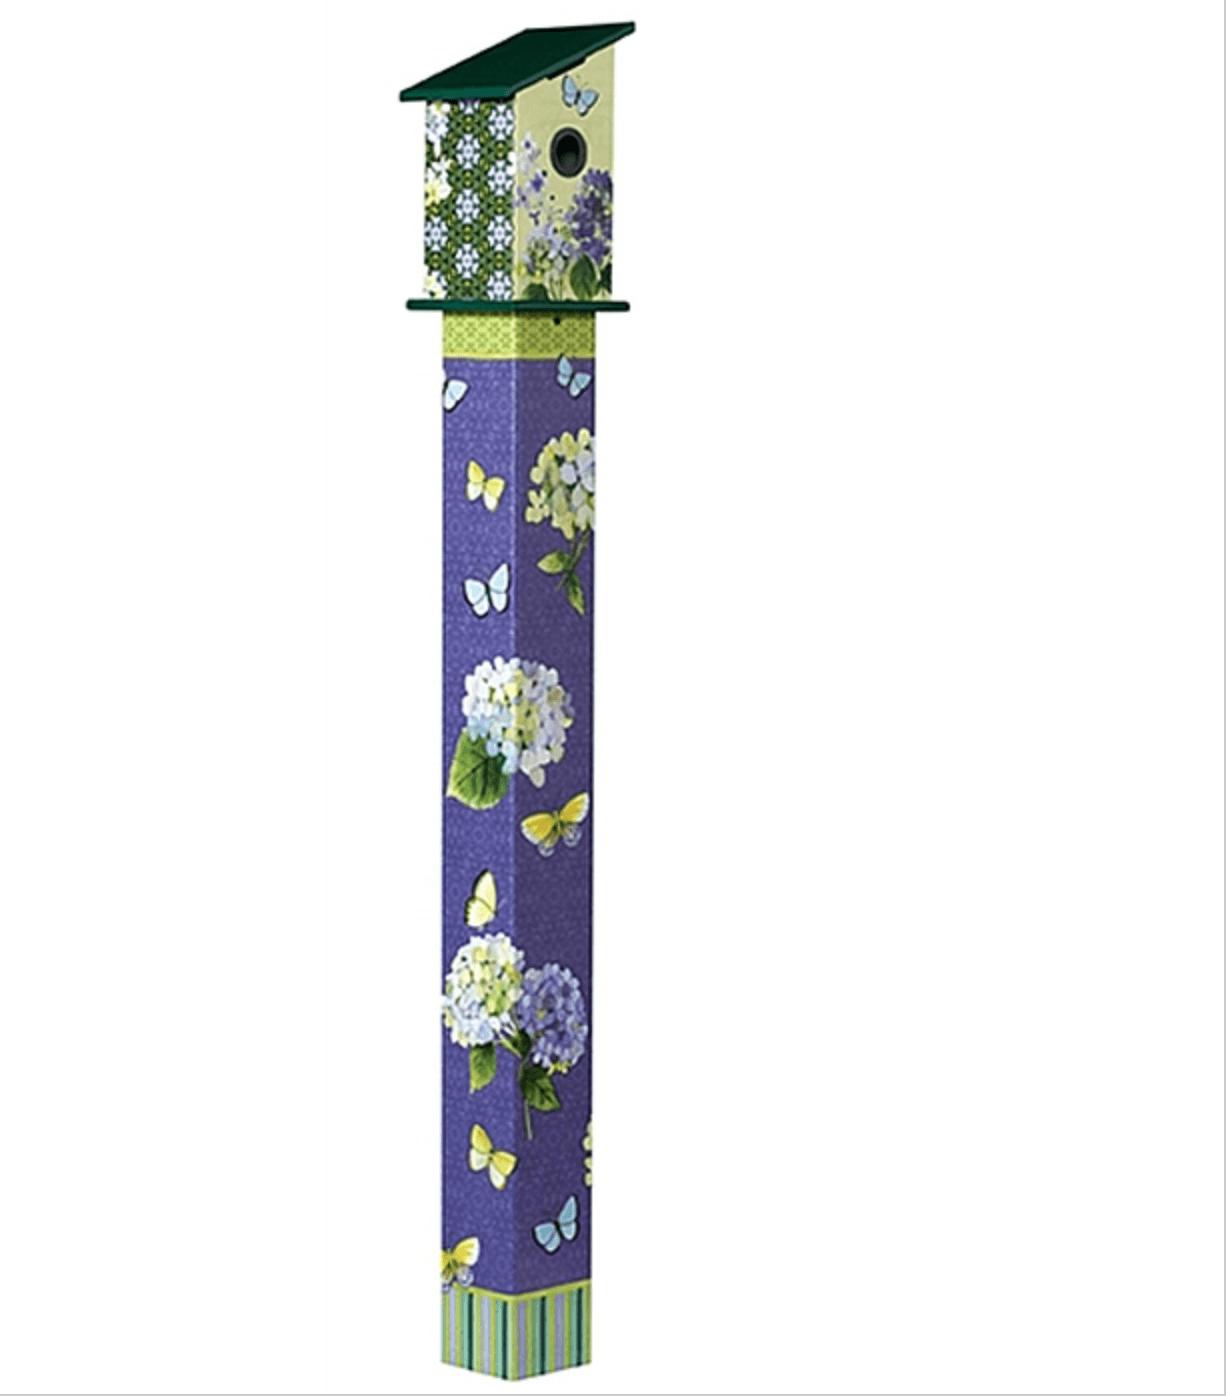 birdhouse art pole